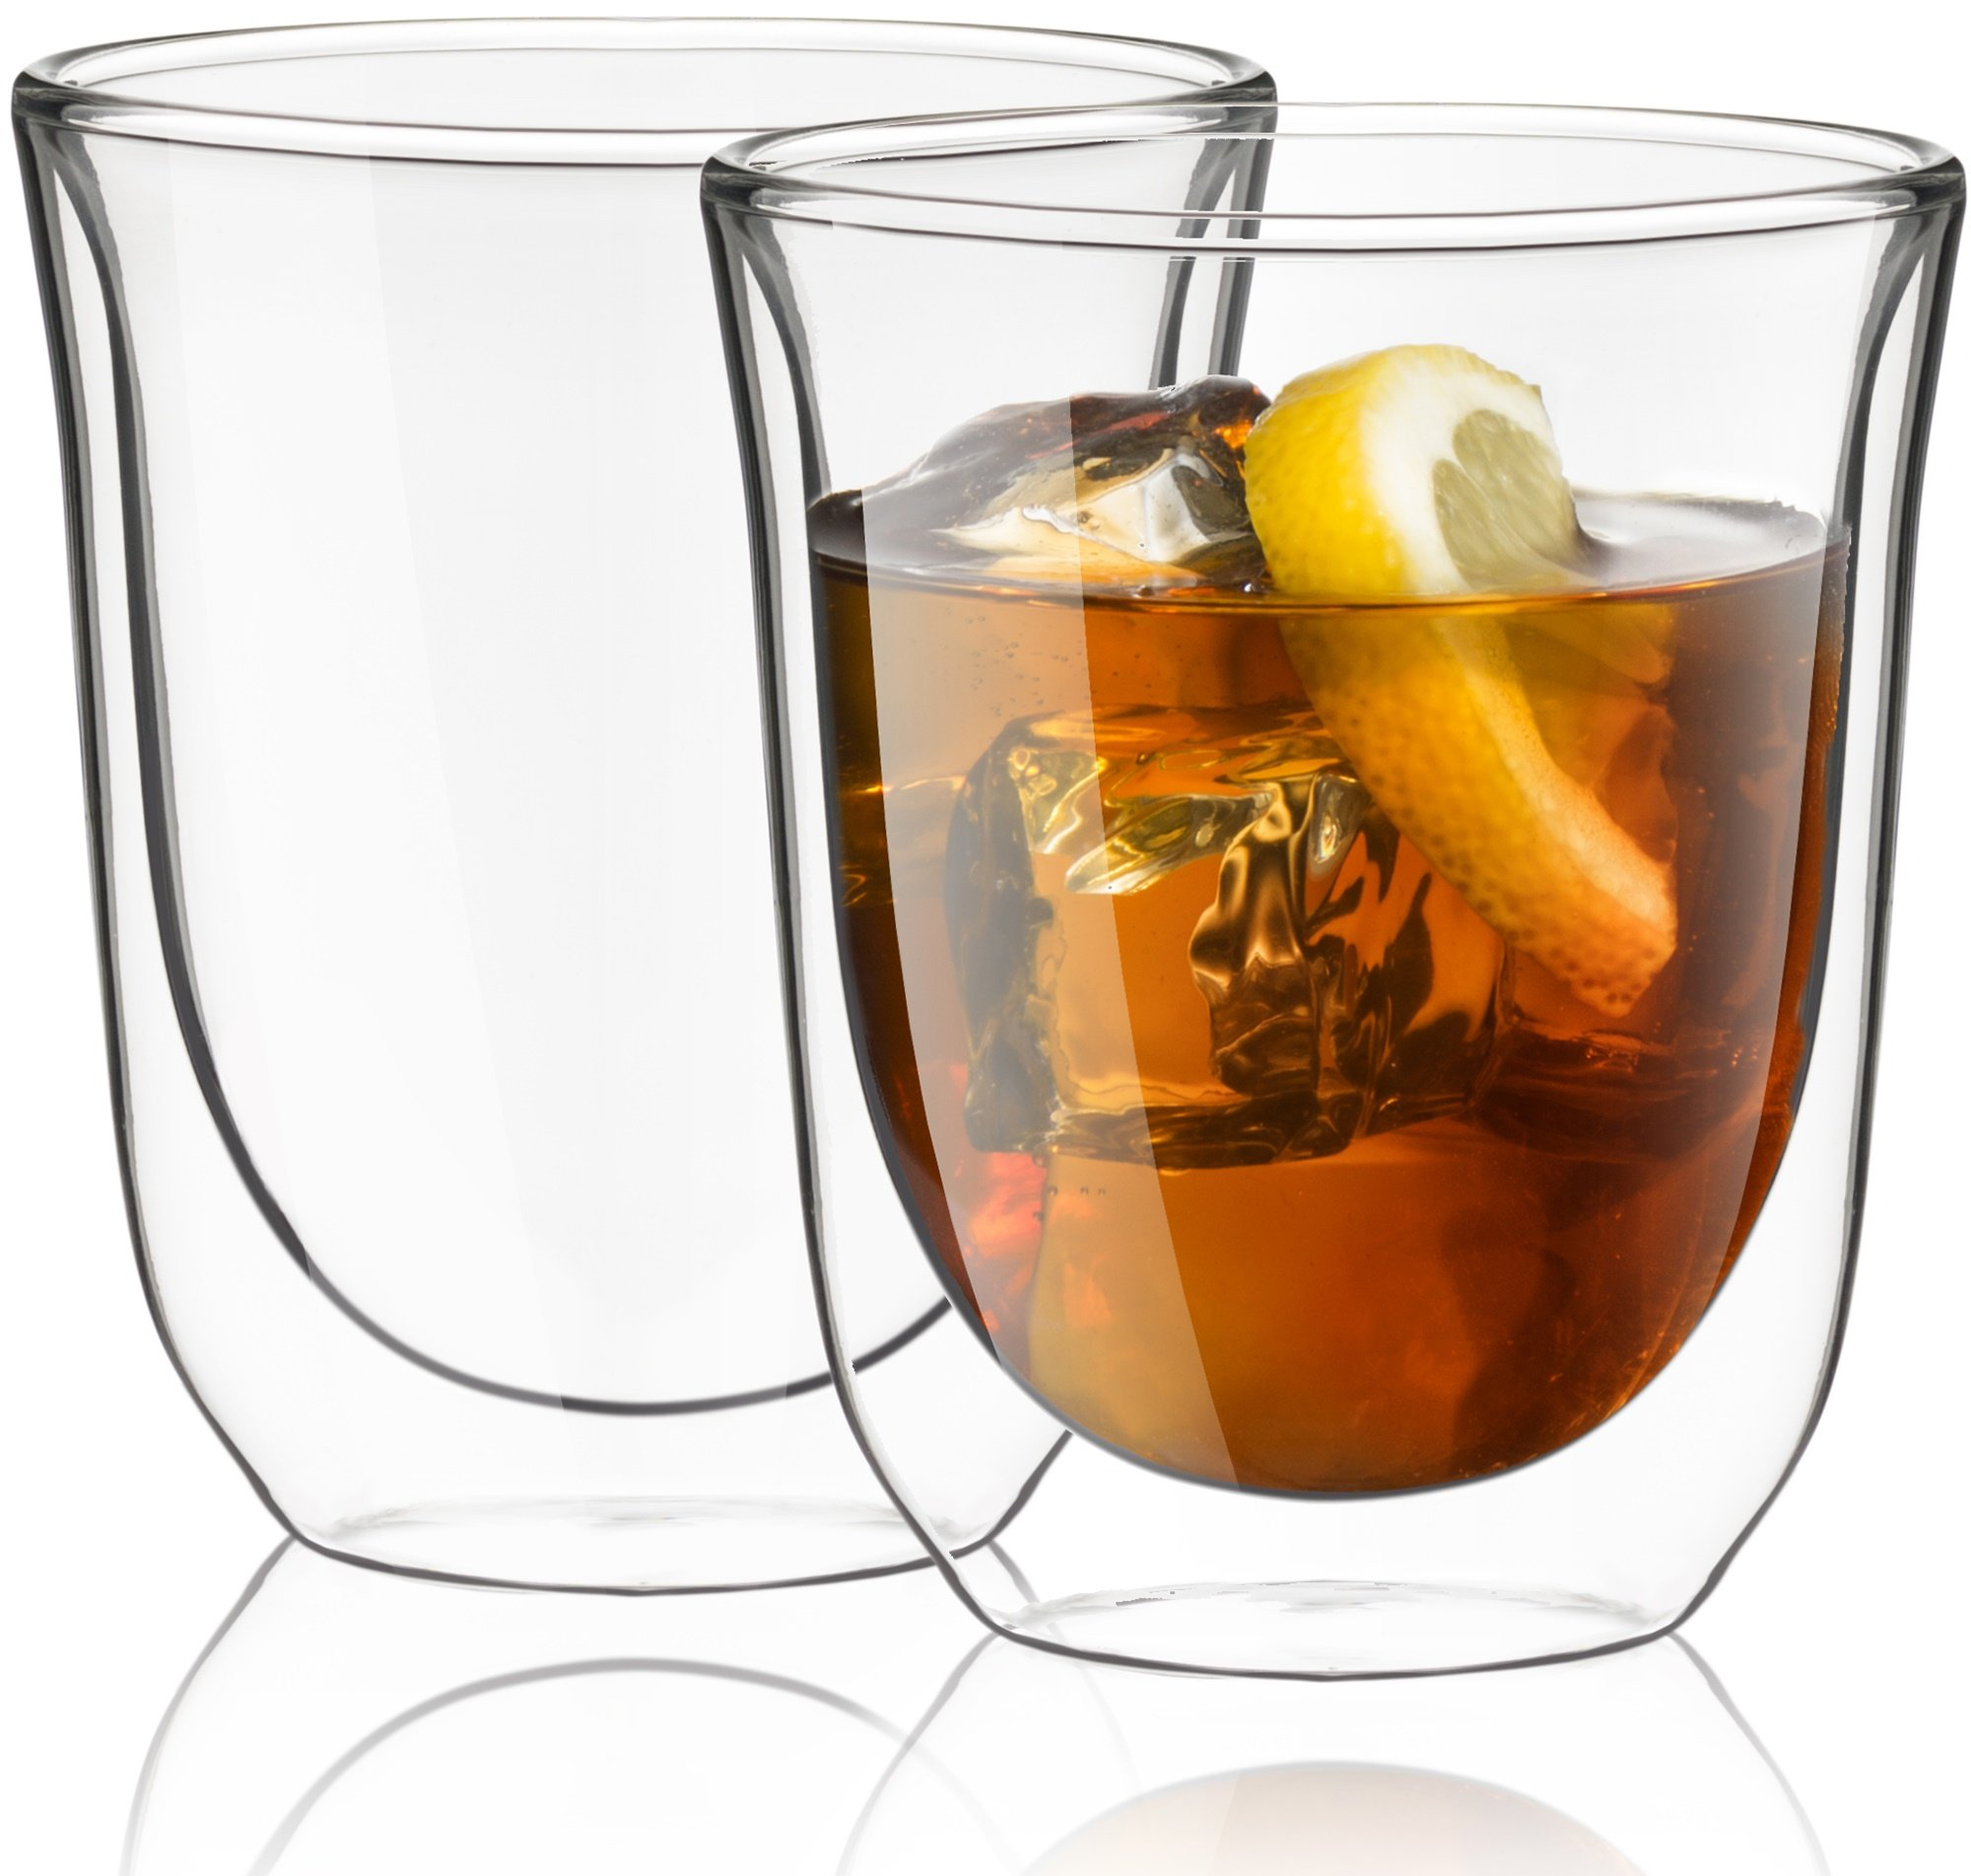 JoyJolt Levitea Double Walled Glasses Thermo Tumber 8.4-Ounce, Set of 2 Barware, Drinkware, Glassware